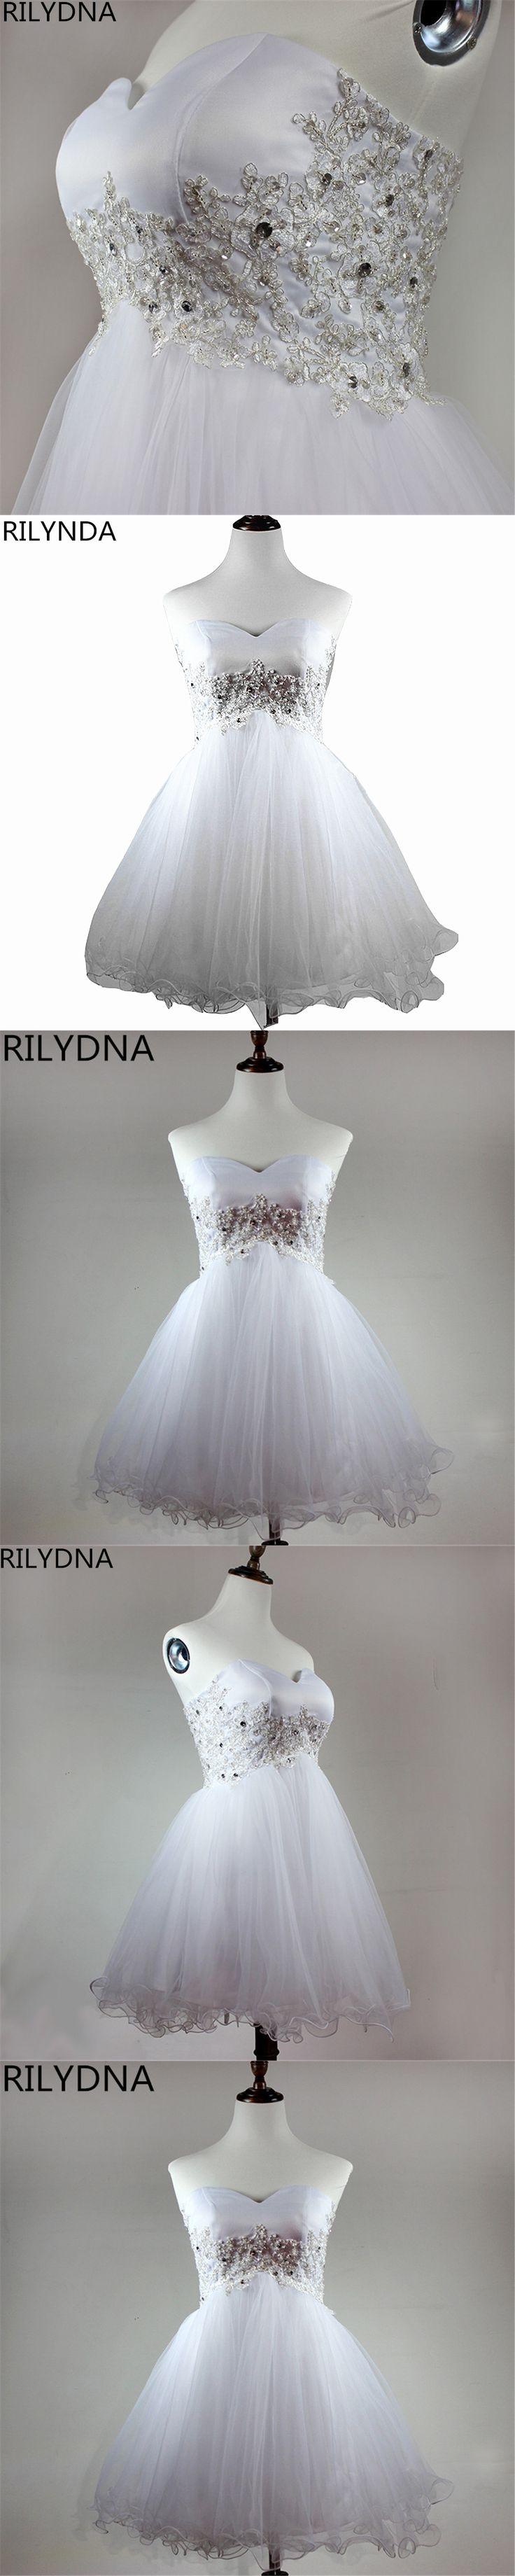 White champagne Beaded Lace Appliques Short Prom Dresses 2017 homecoming dresses vestido de festa Knee Length Party gala dress